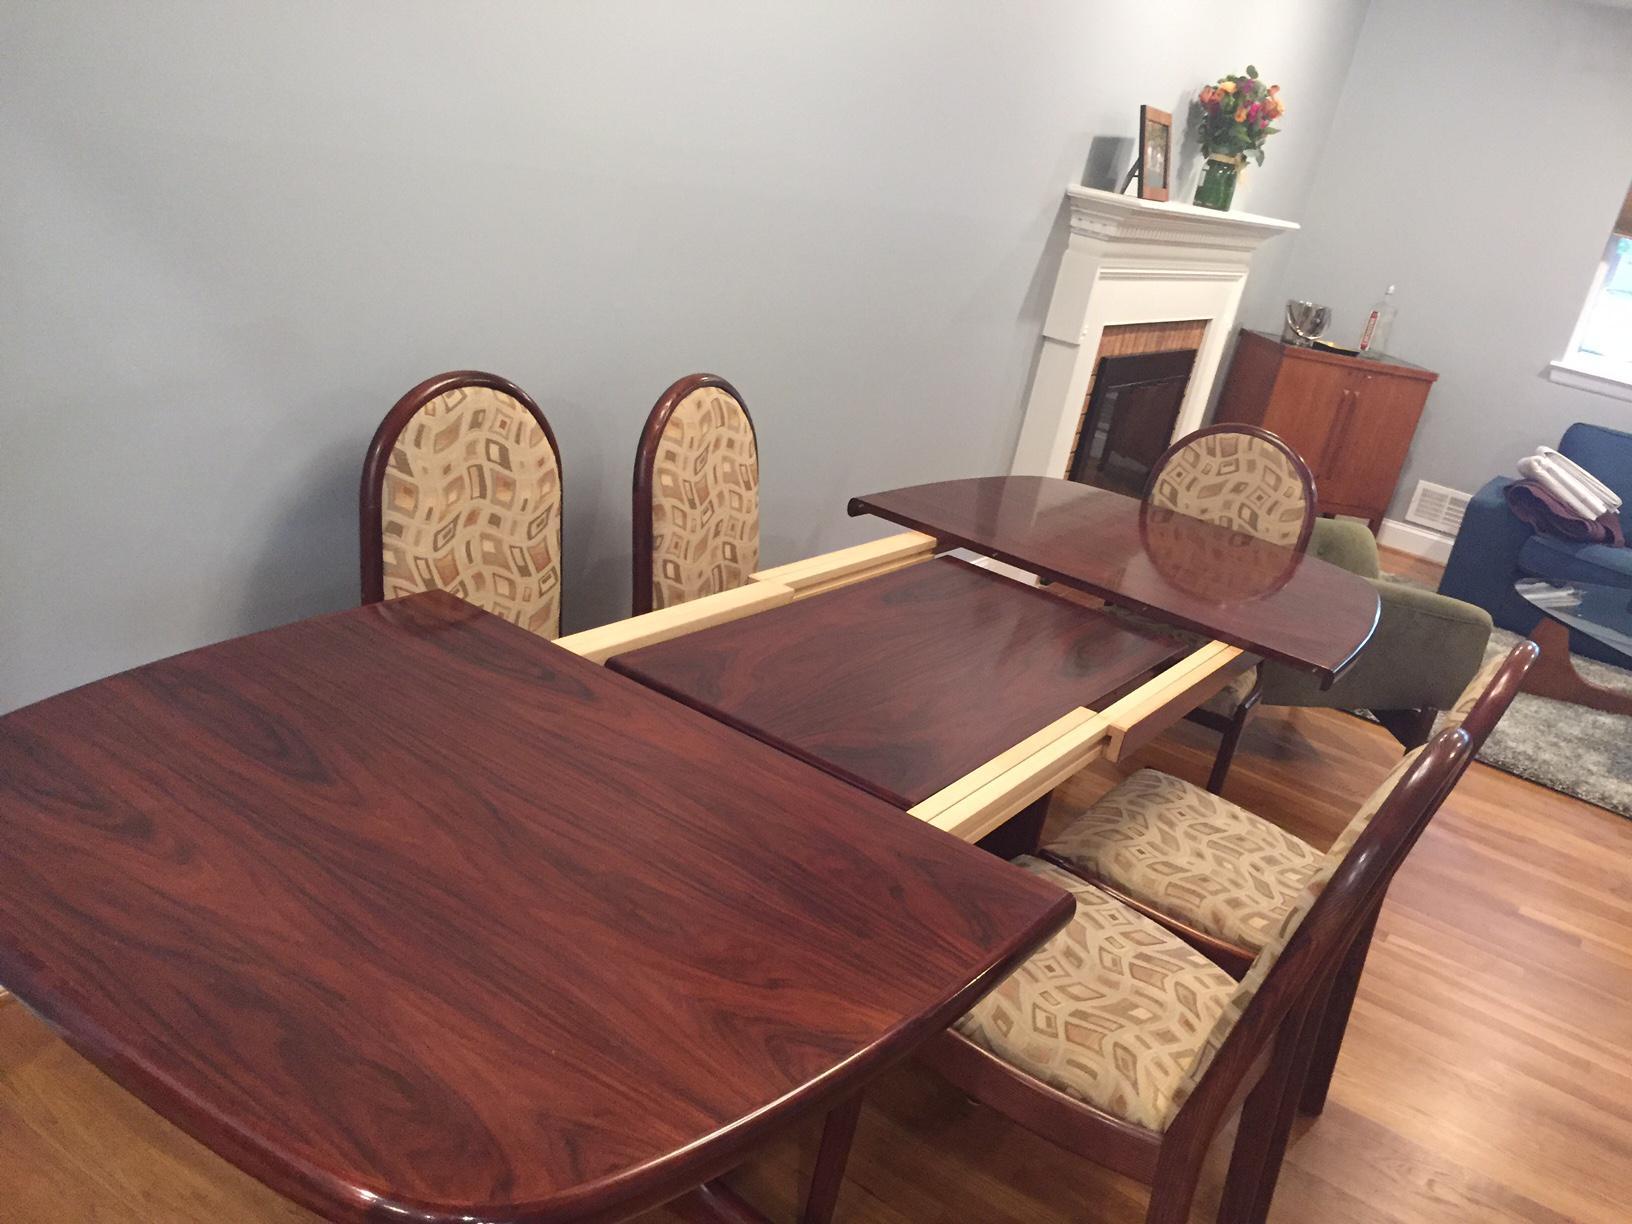 skovby rosewood dining chairs gander mountain set | chairish